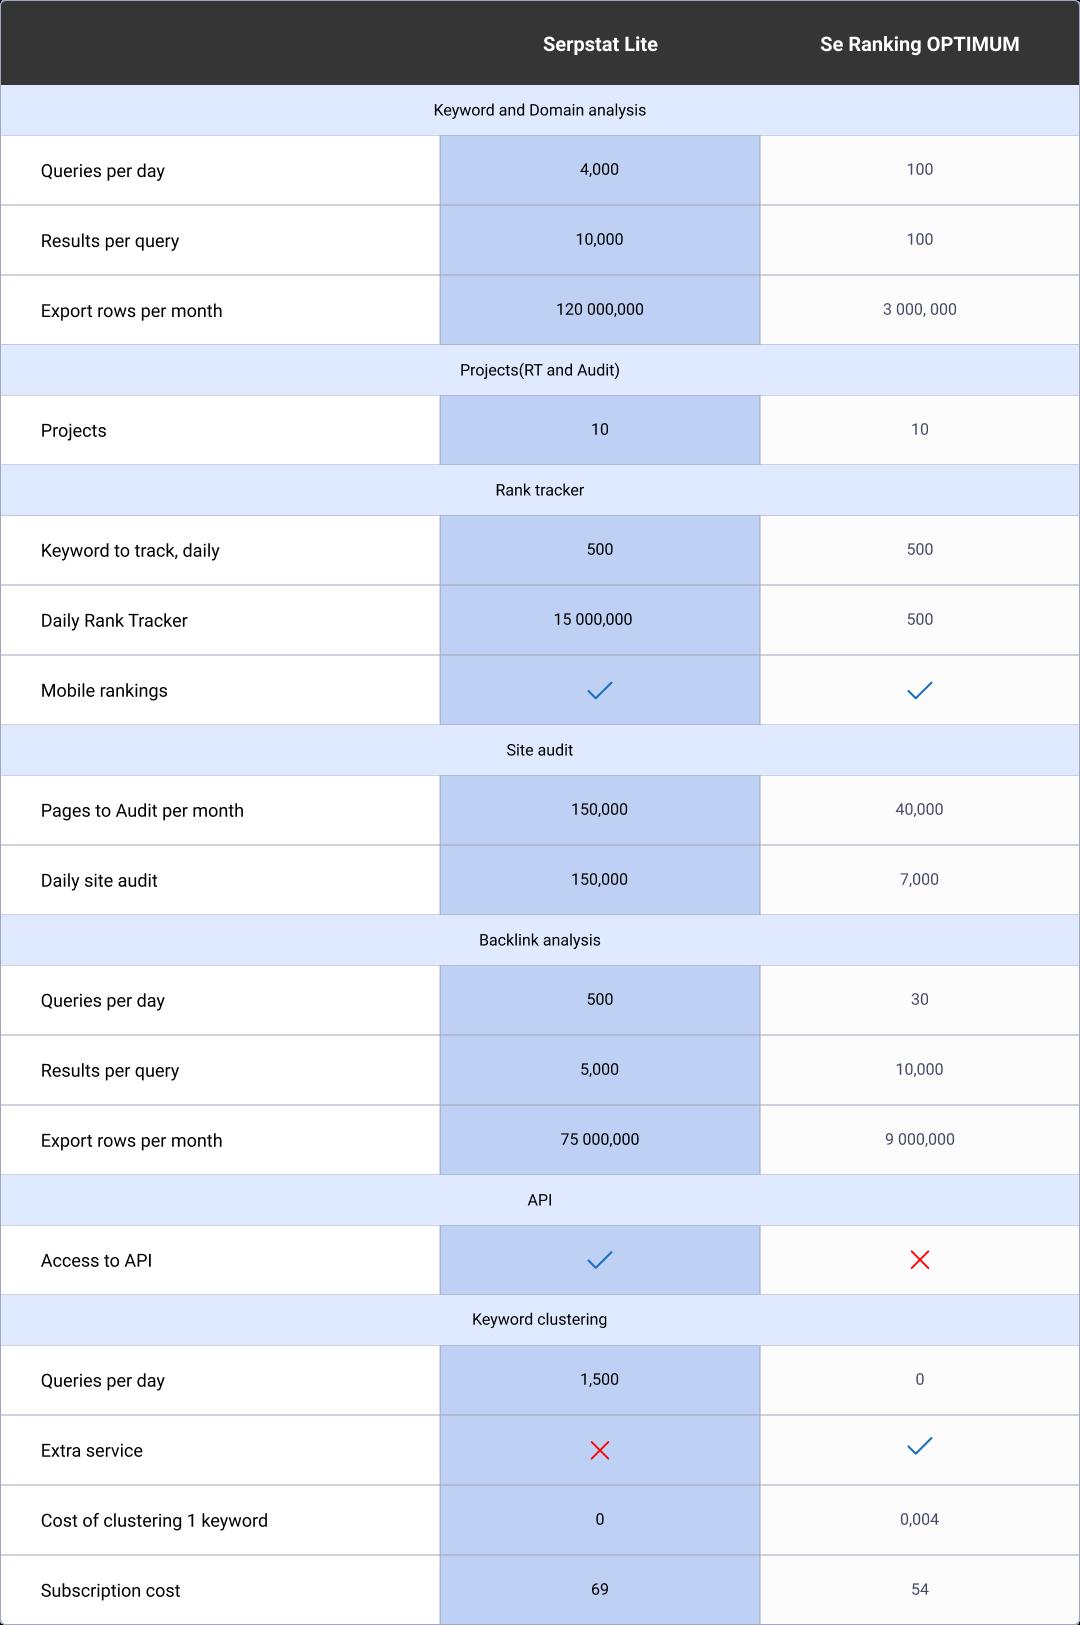 EN Serpstat vs SE Ranking 16261788483674